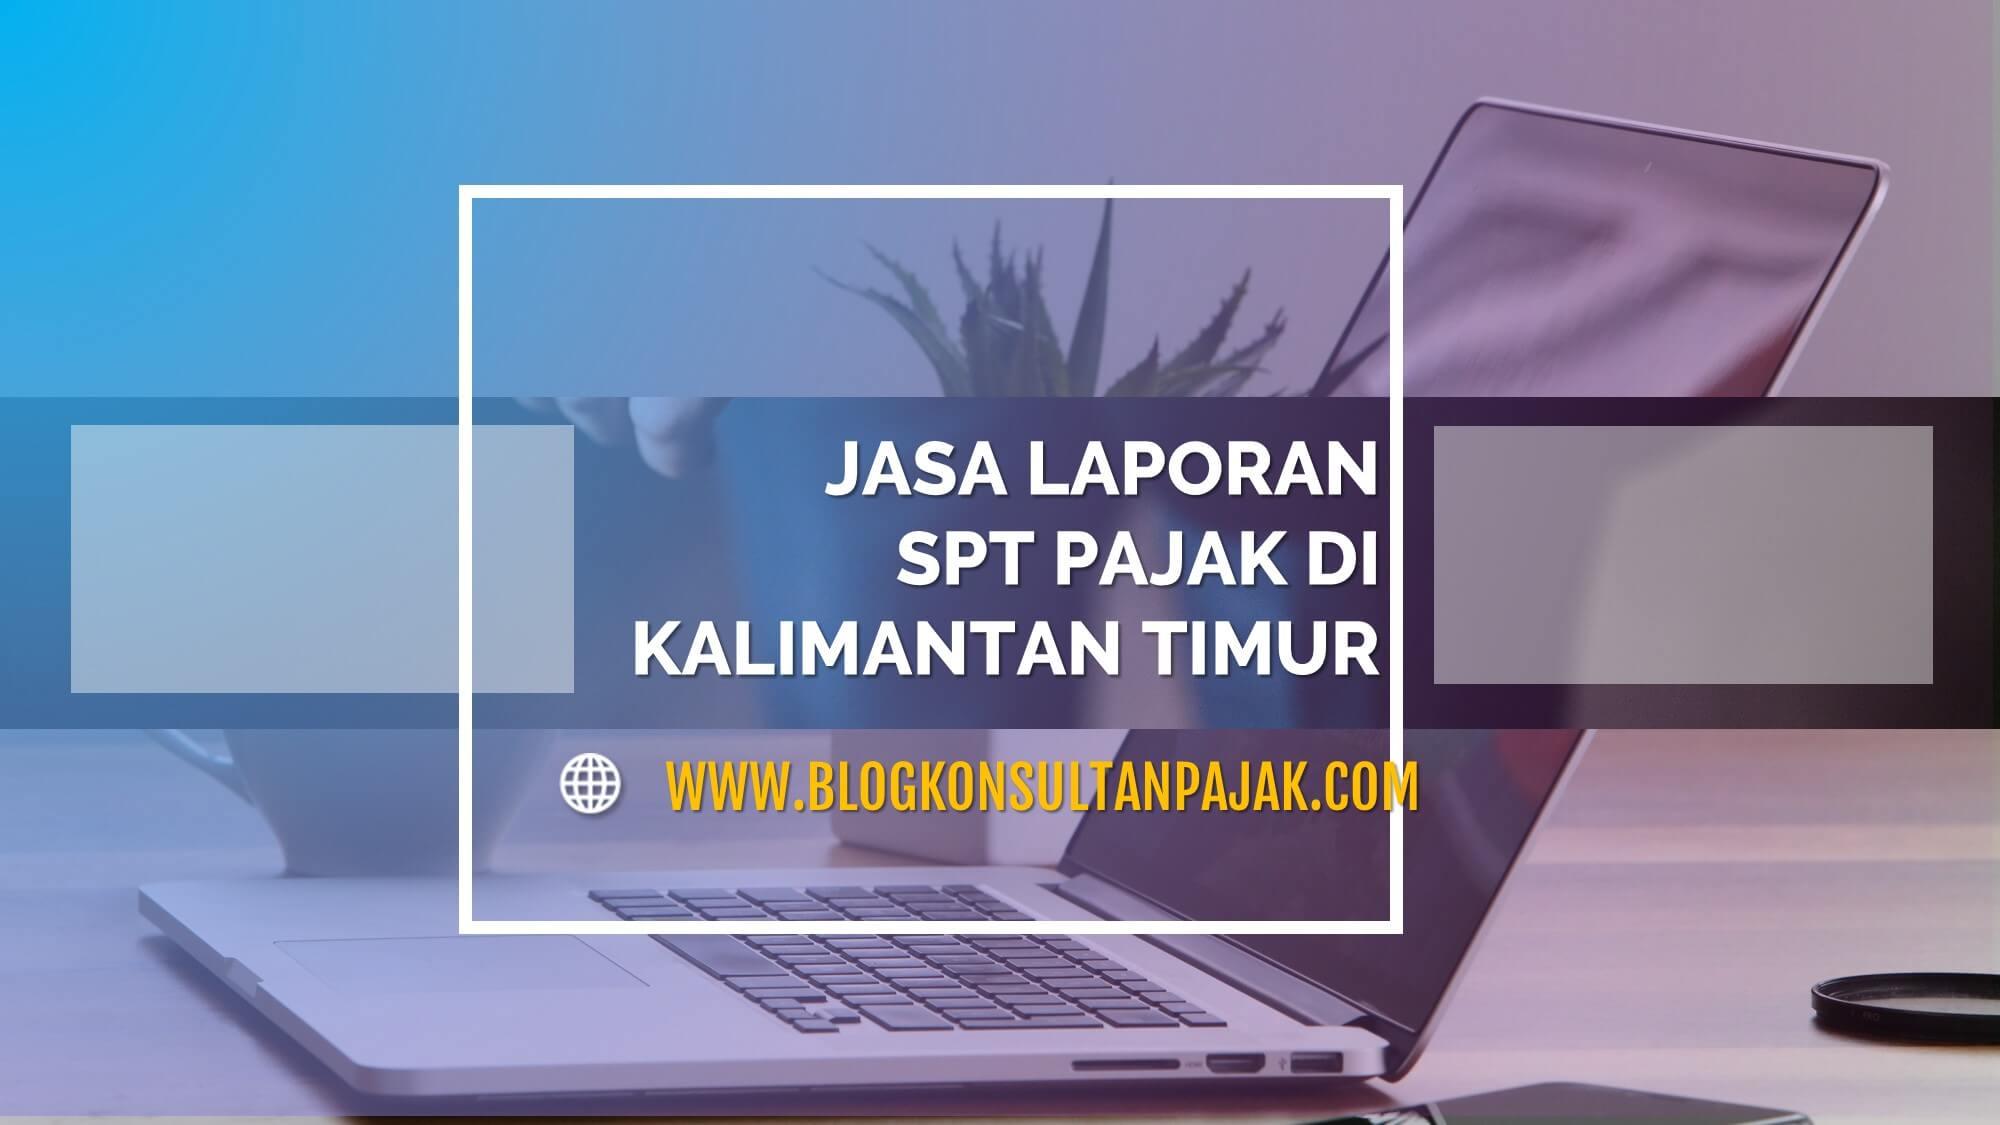 Jasa Laporan Pajak Bulanan Perusahaan Di Lempake Samarinda Utara Samarinda Kalimantan Timur